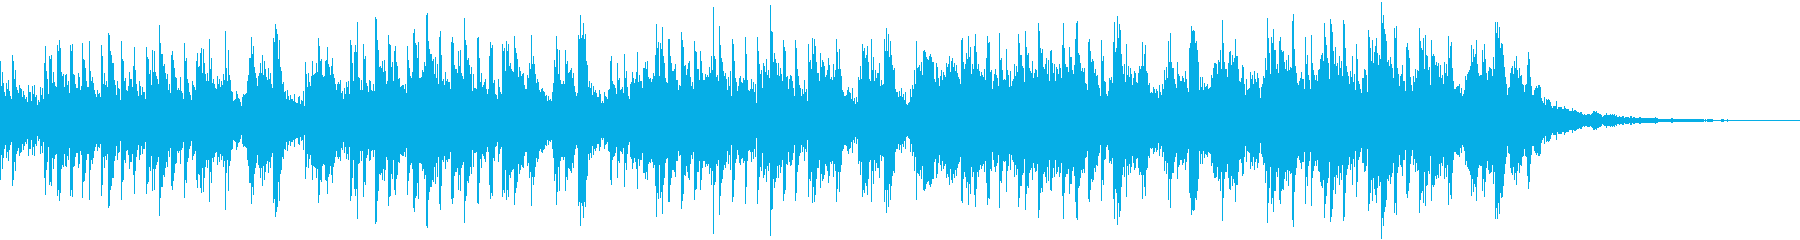 T.V.コンテンポラリーインスト反...の再生済みの波形